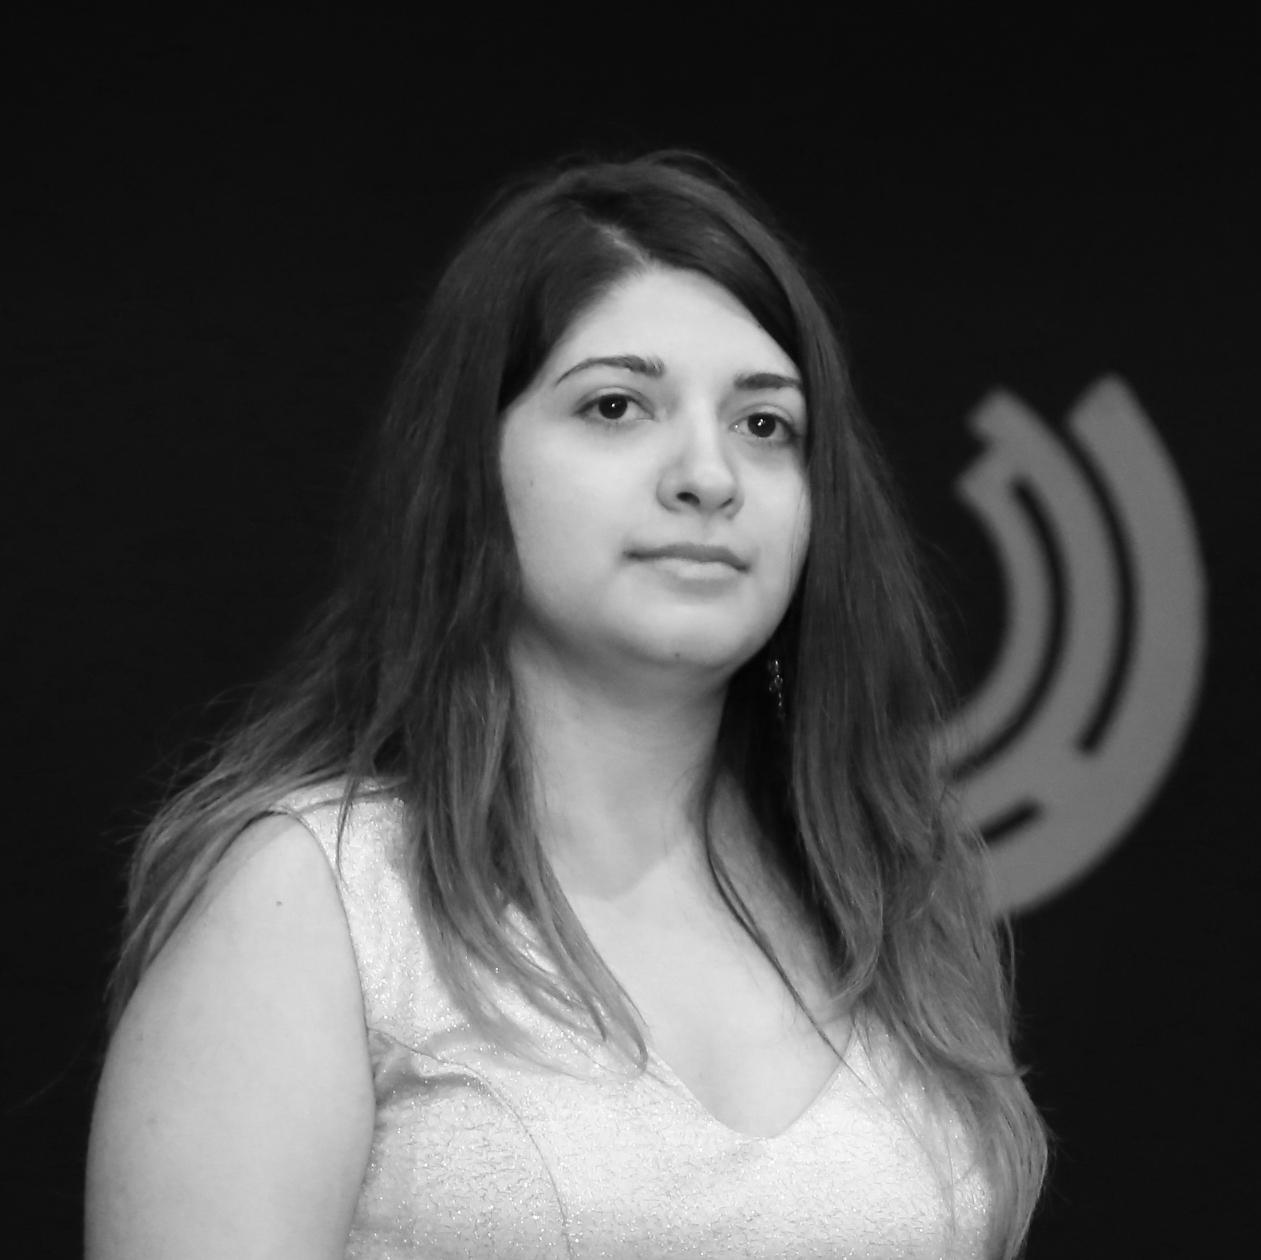 Yelena Aslanyan, ARMENIA